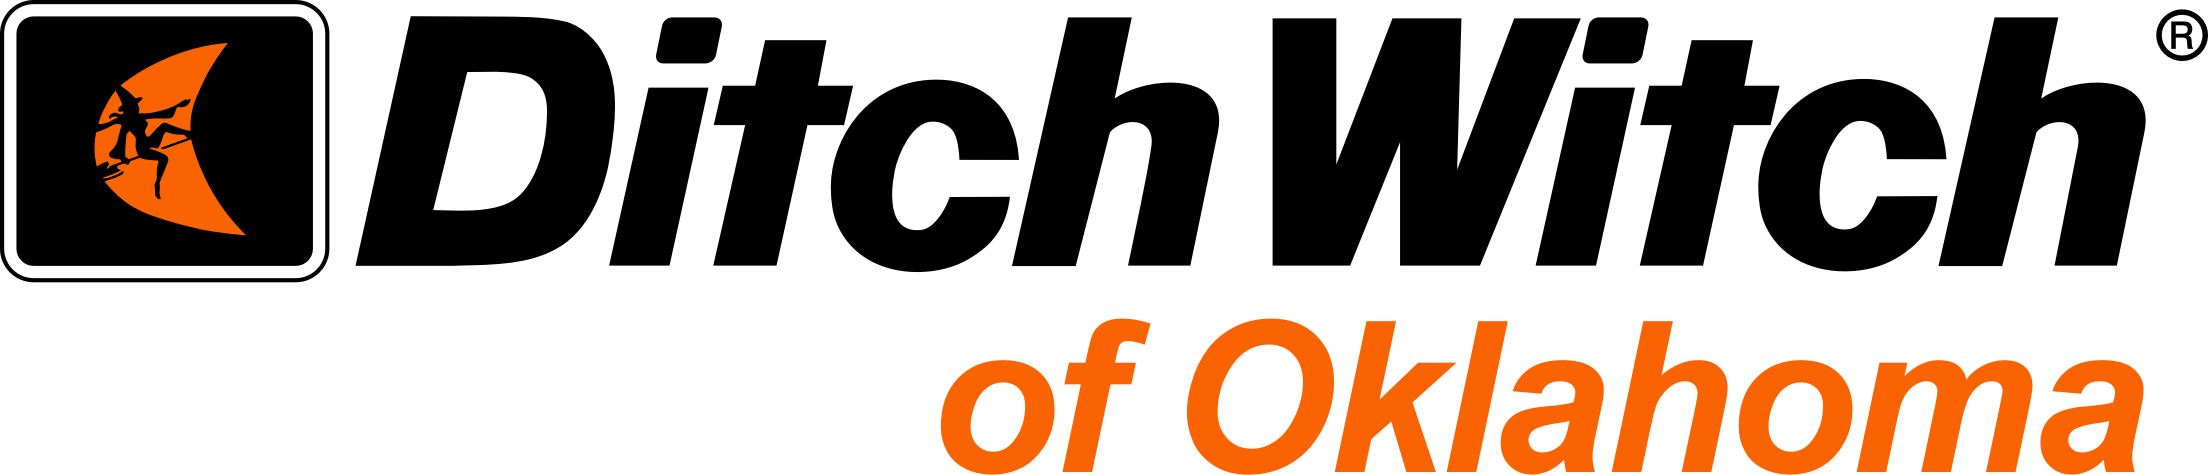 Ditch Witch of Oklahoma Company Logo